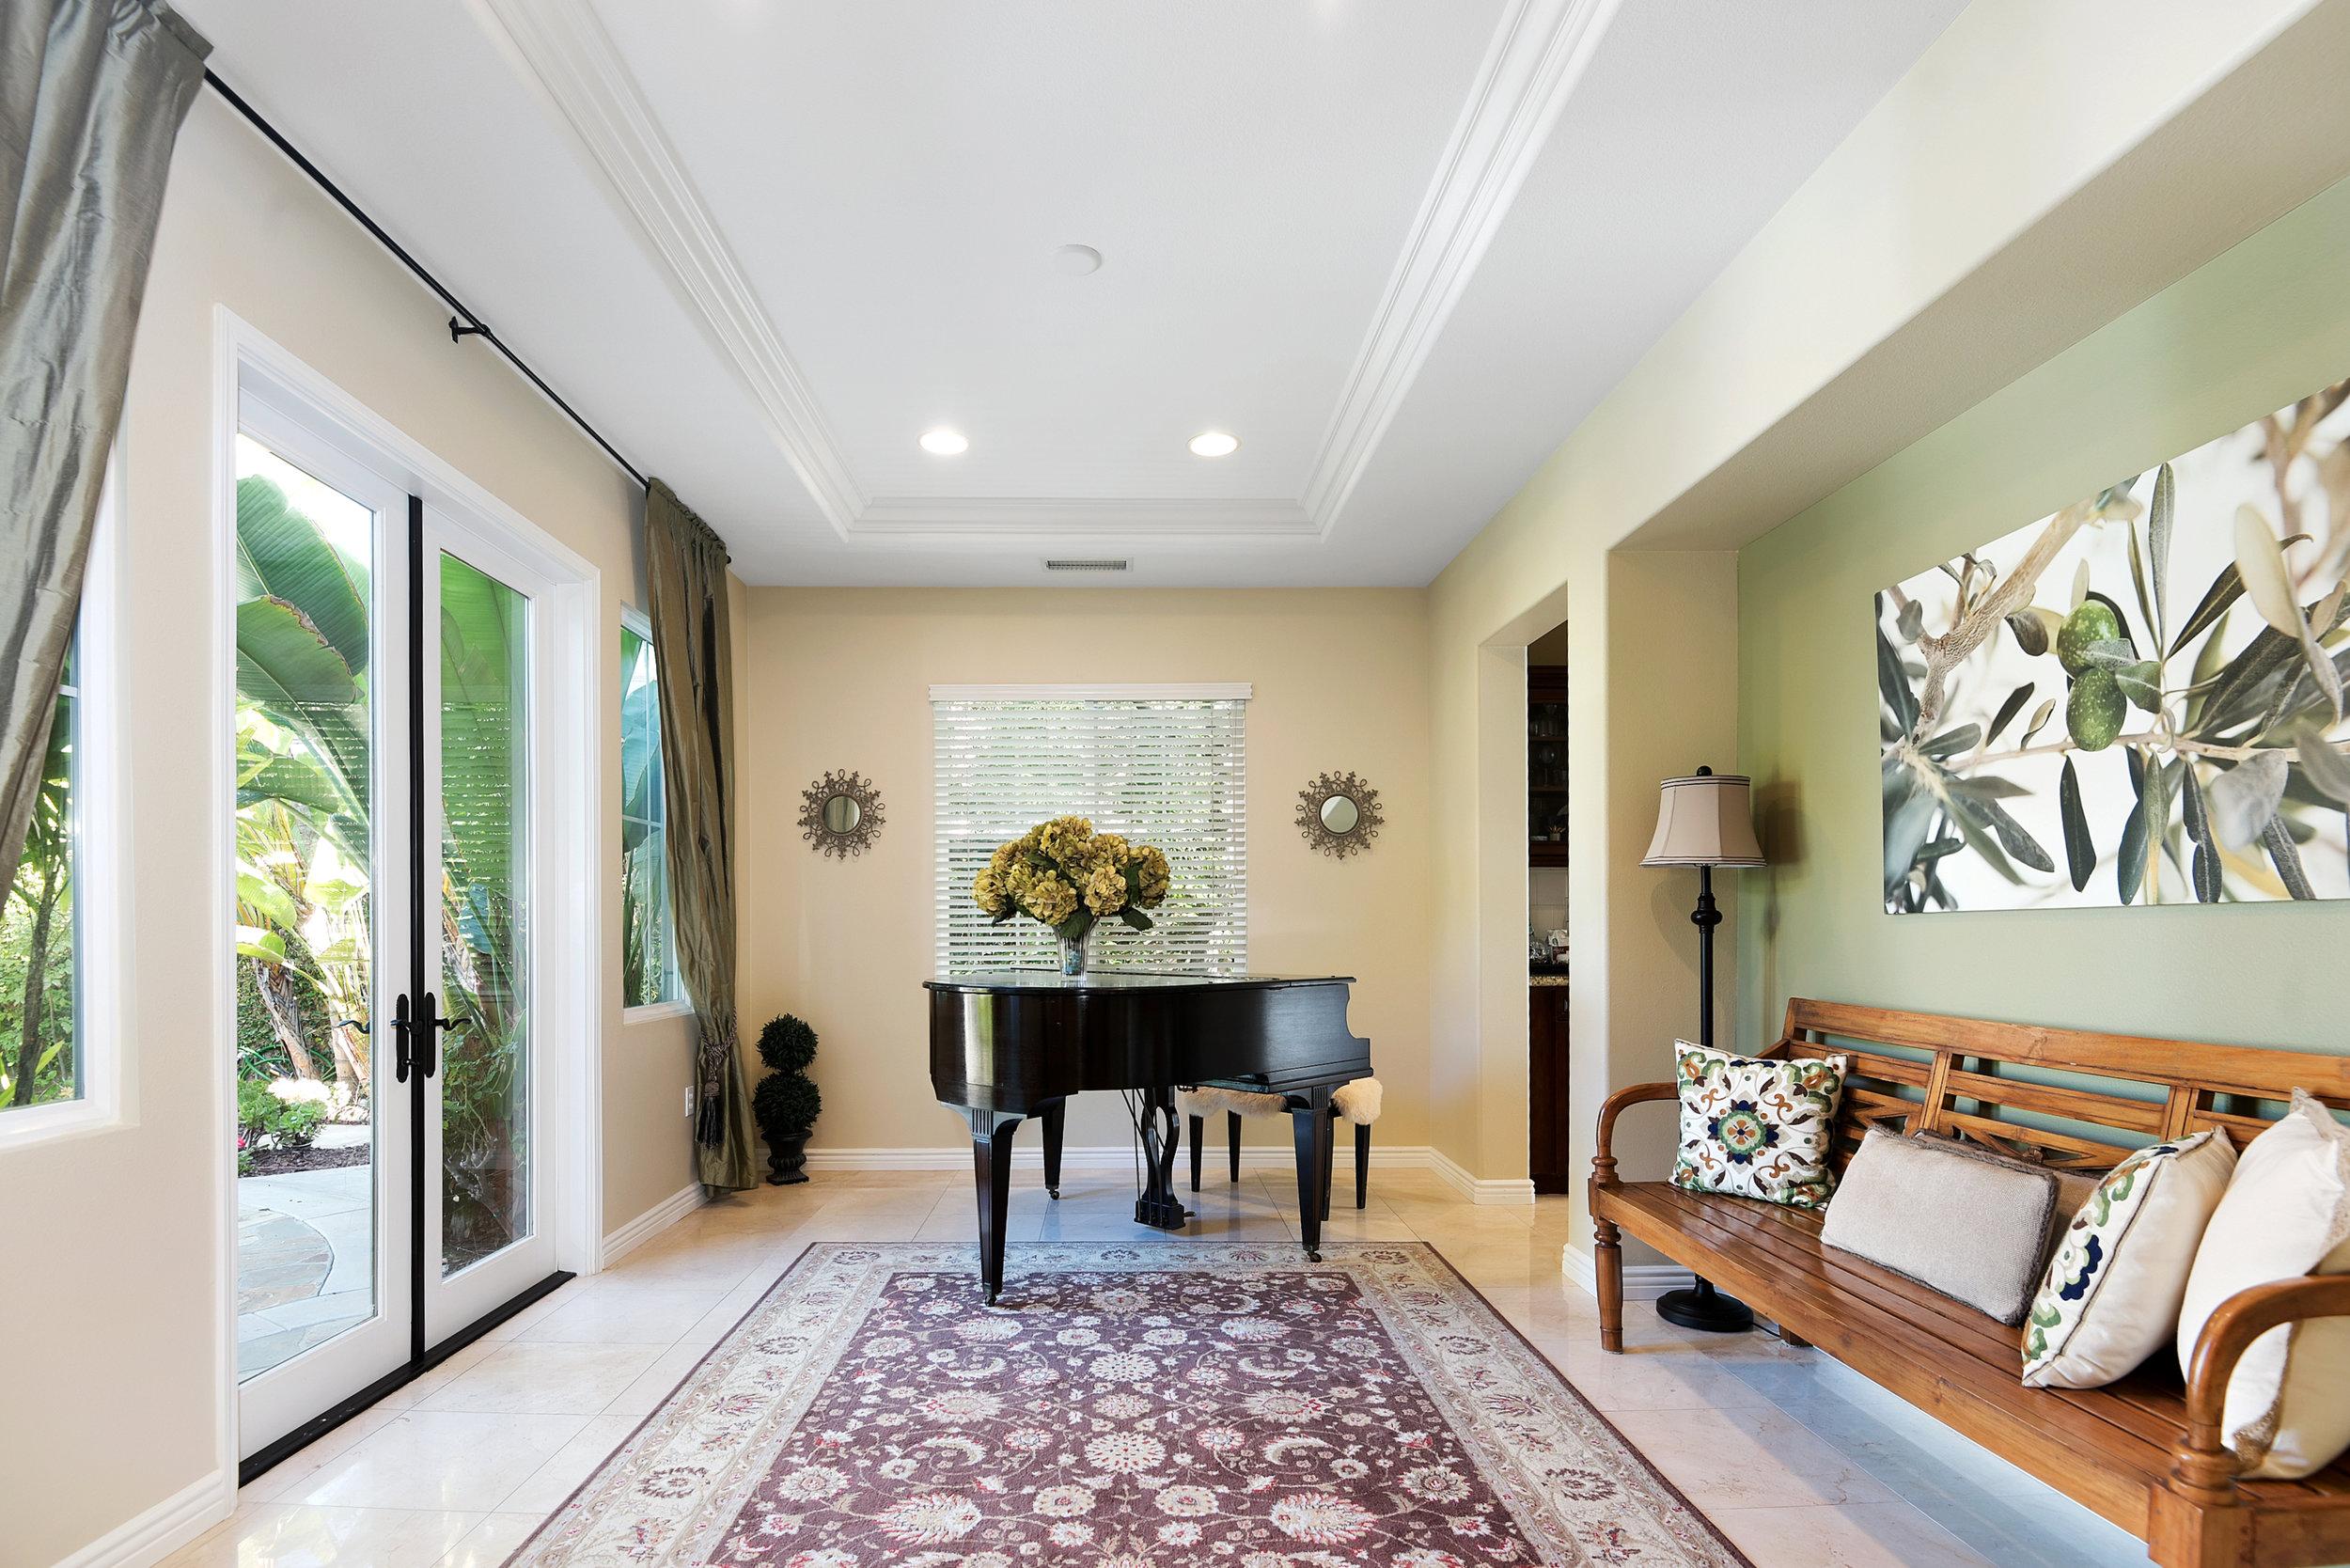 7 Kernville - $1,310,000